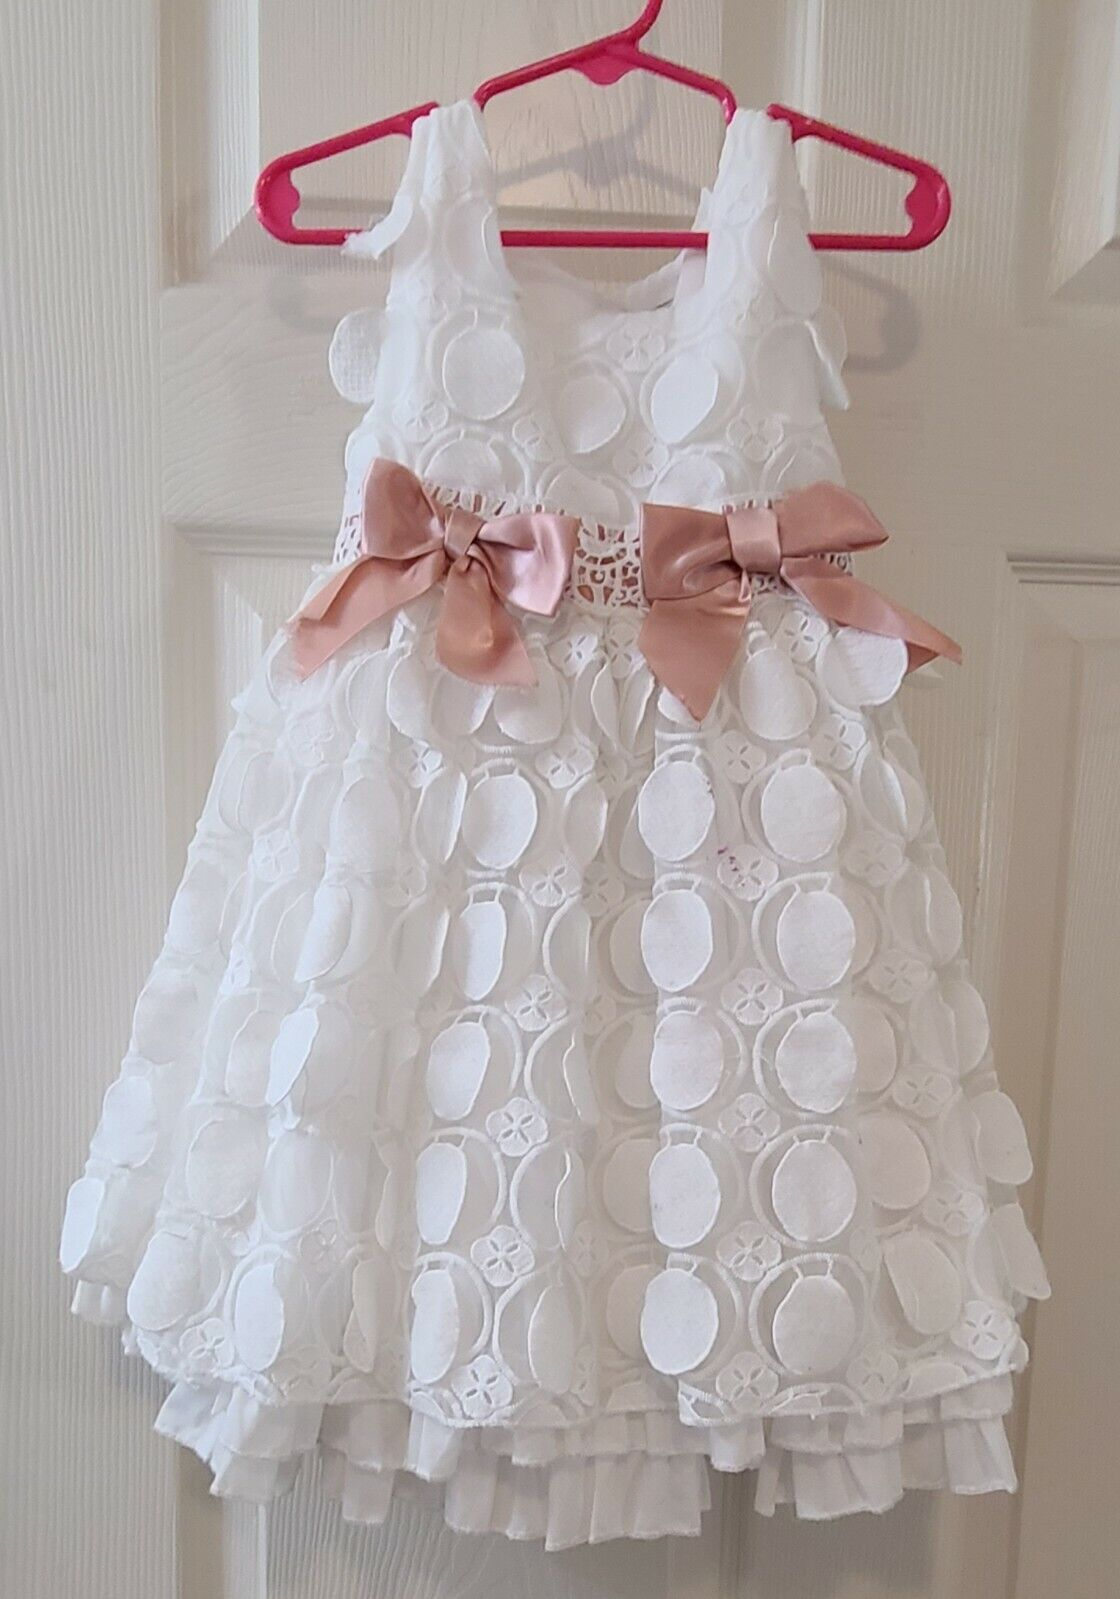 Senskids Size 2 White Dress Formal Flower Girl Wedding Formal Adorable See Pics